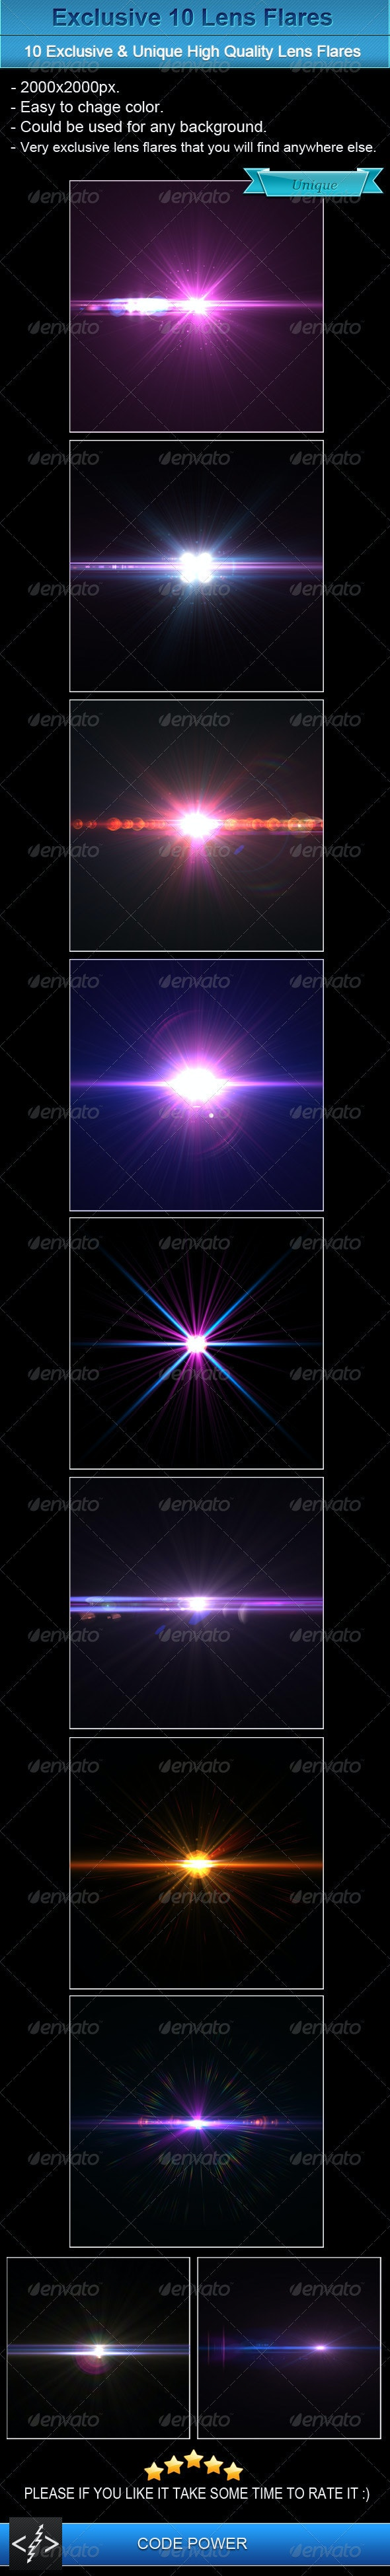 Exclusive 10 Lens Flares - Flourishes / Swirls Decorative